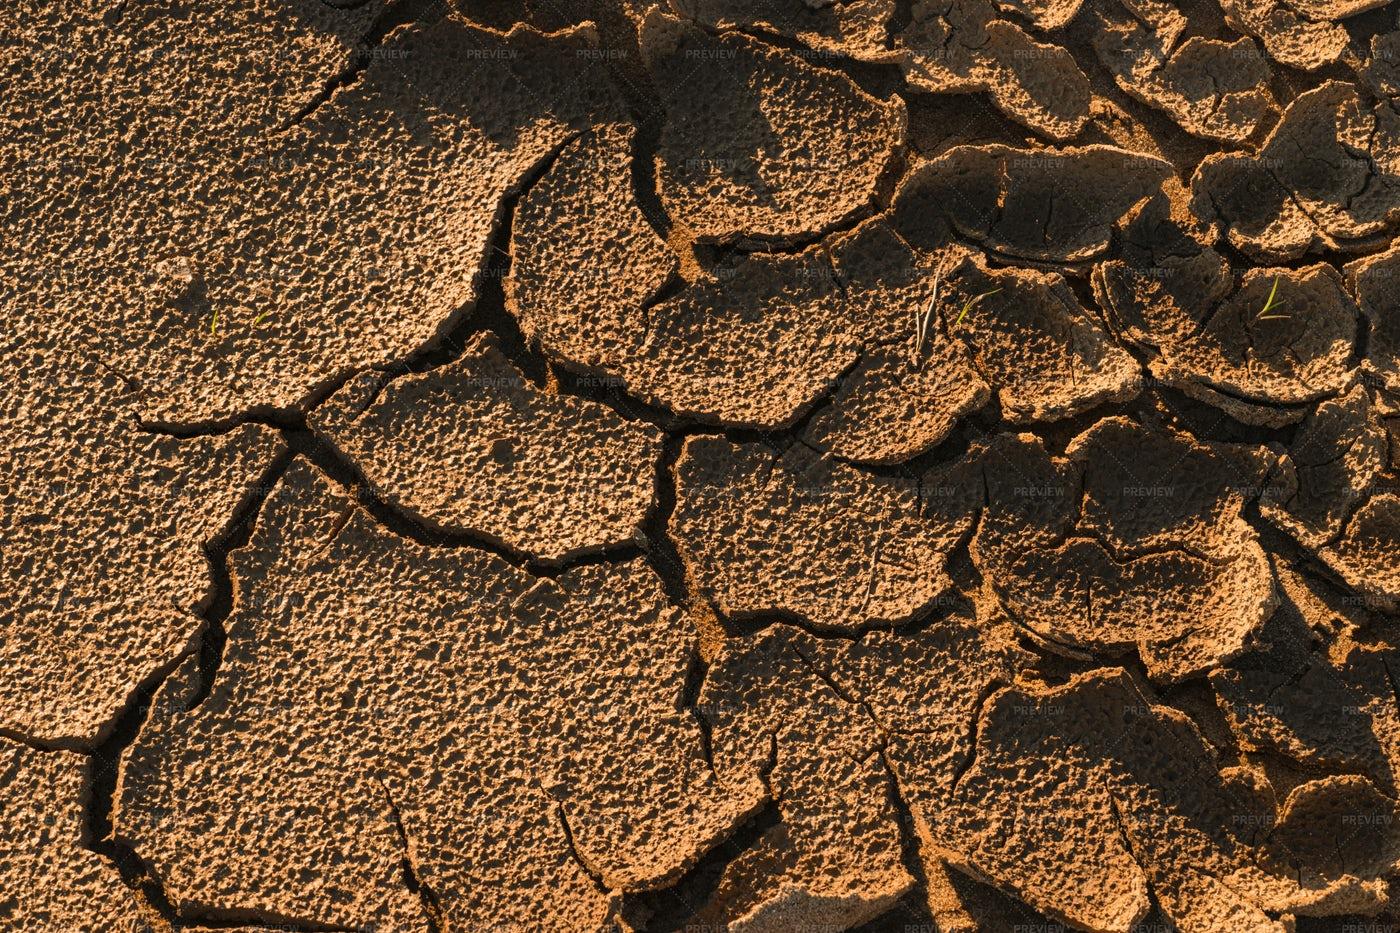 Soil Under The Heat: Stock Photos